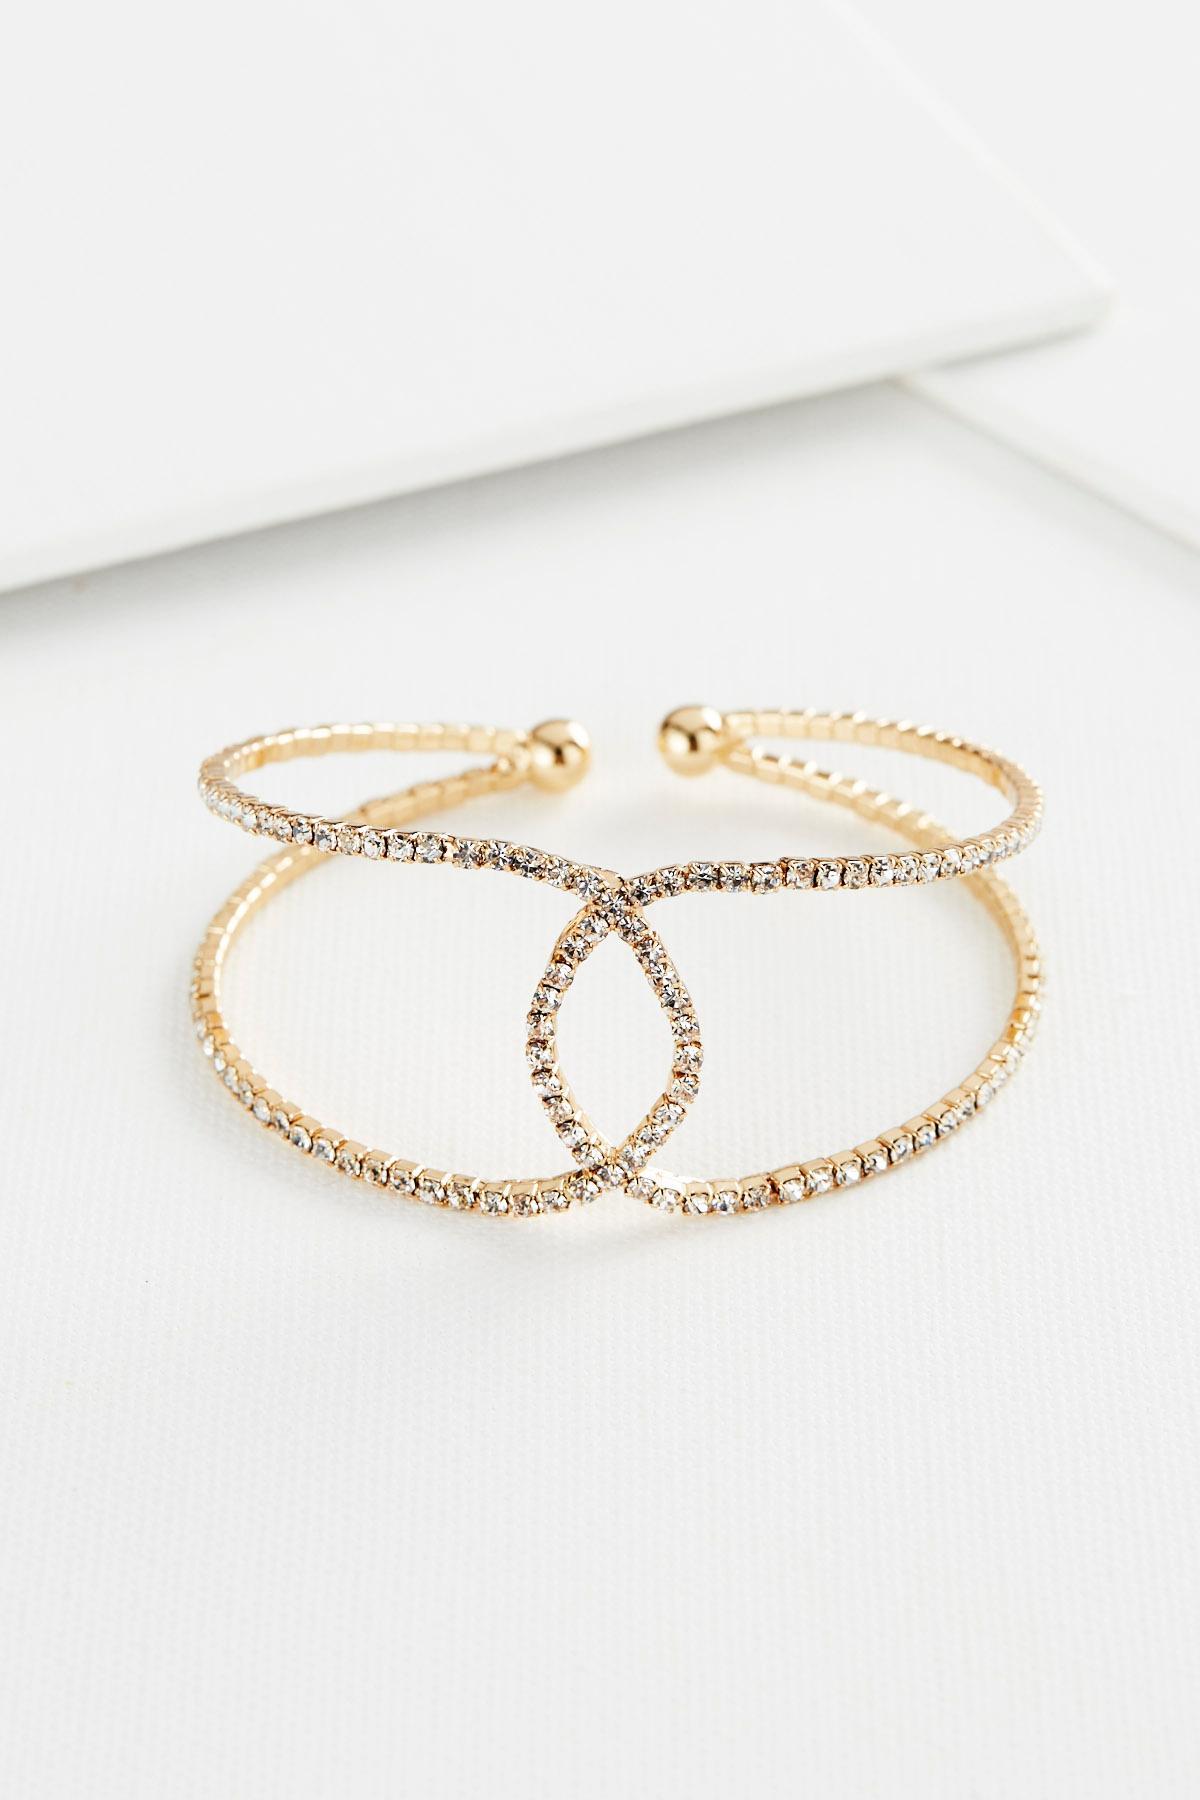 Interlocked Pave Cuff Bracelet